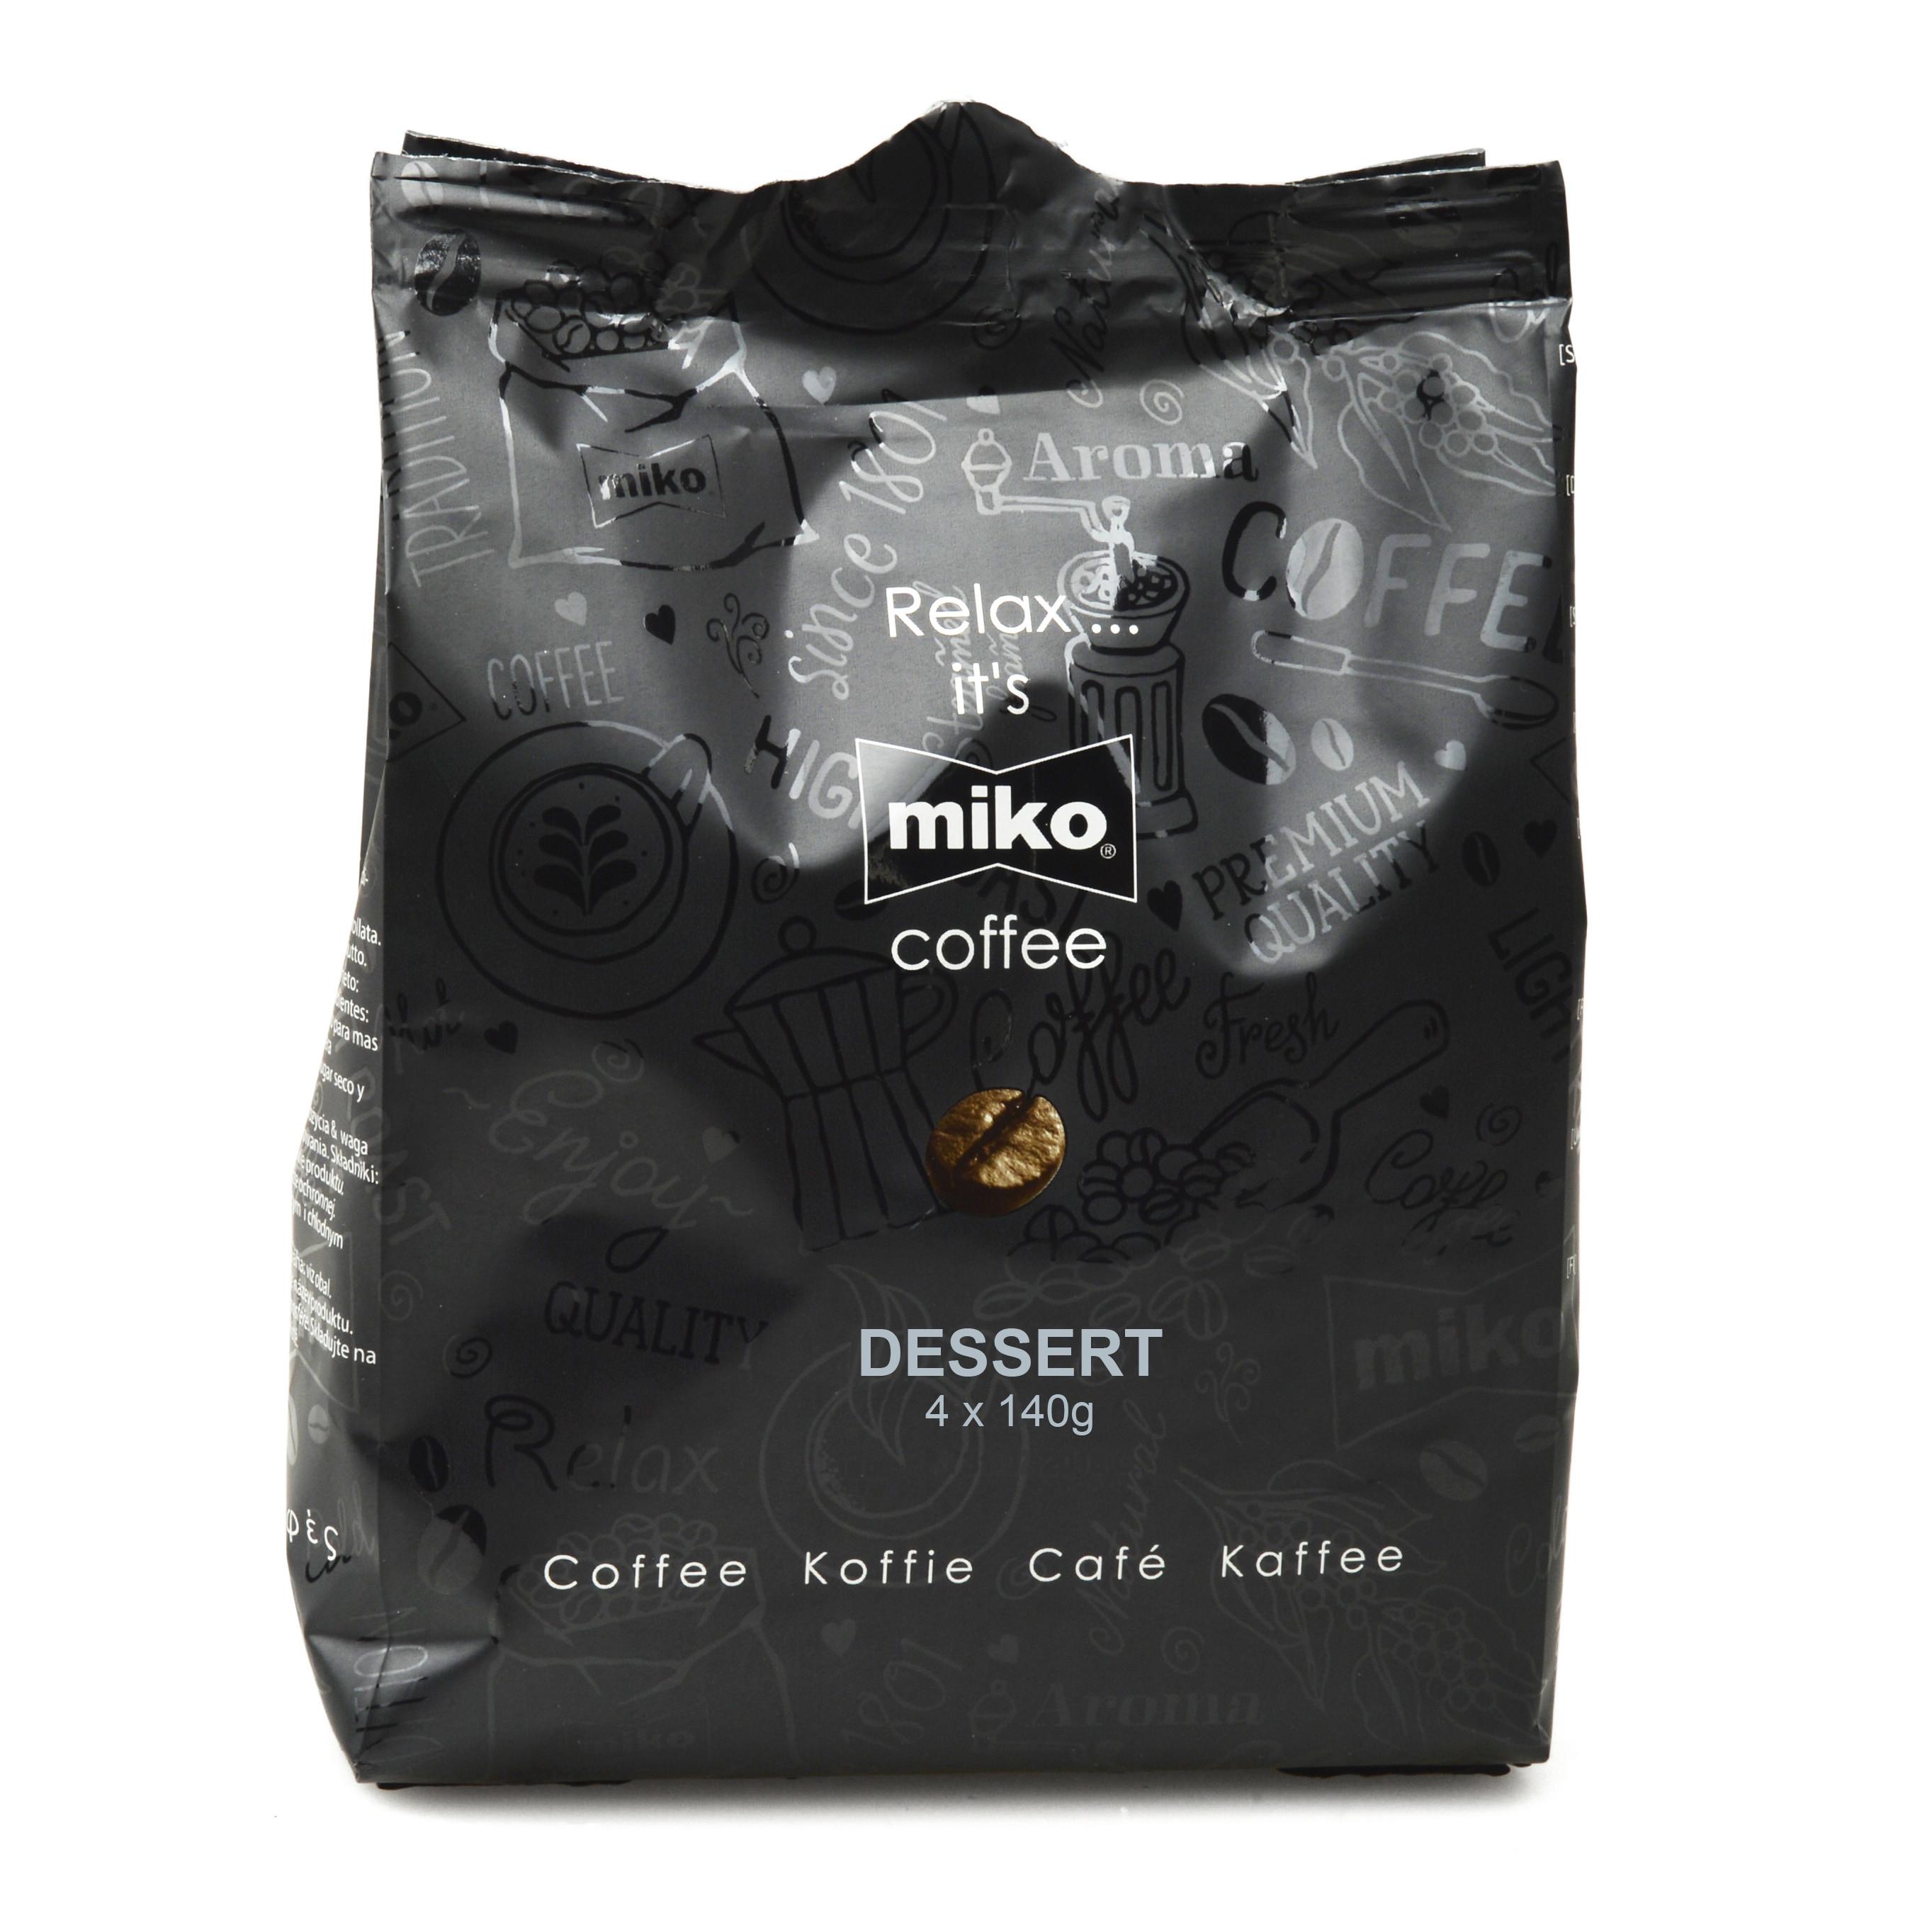 Pouch Miko 508 dessert 48x140gr Vending (Koffie)